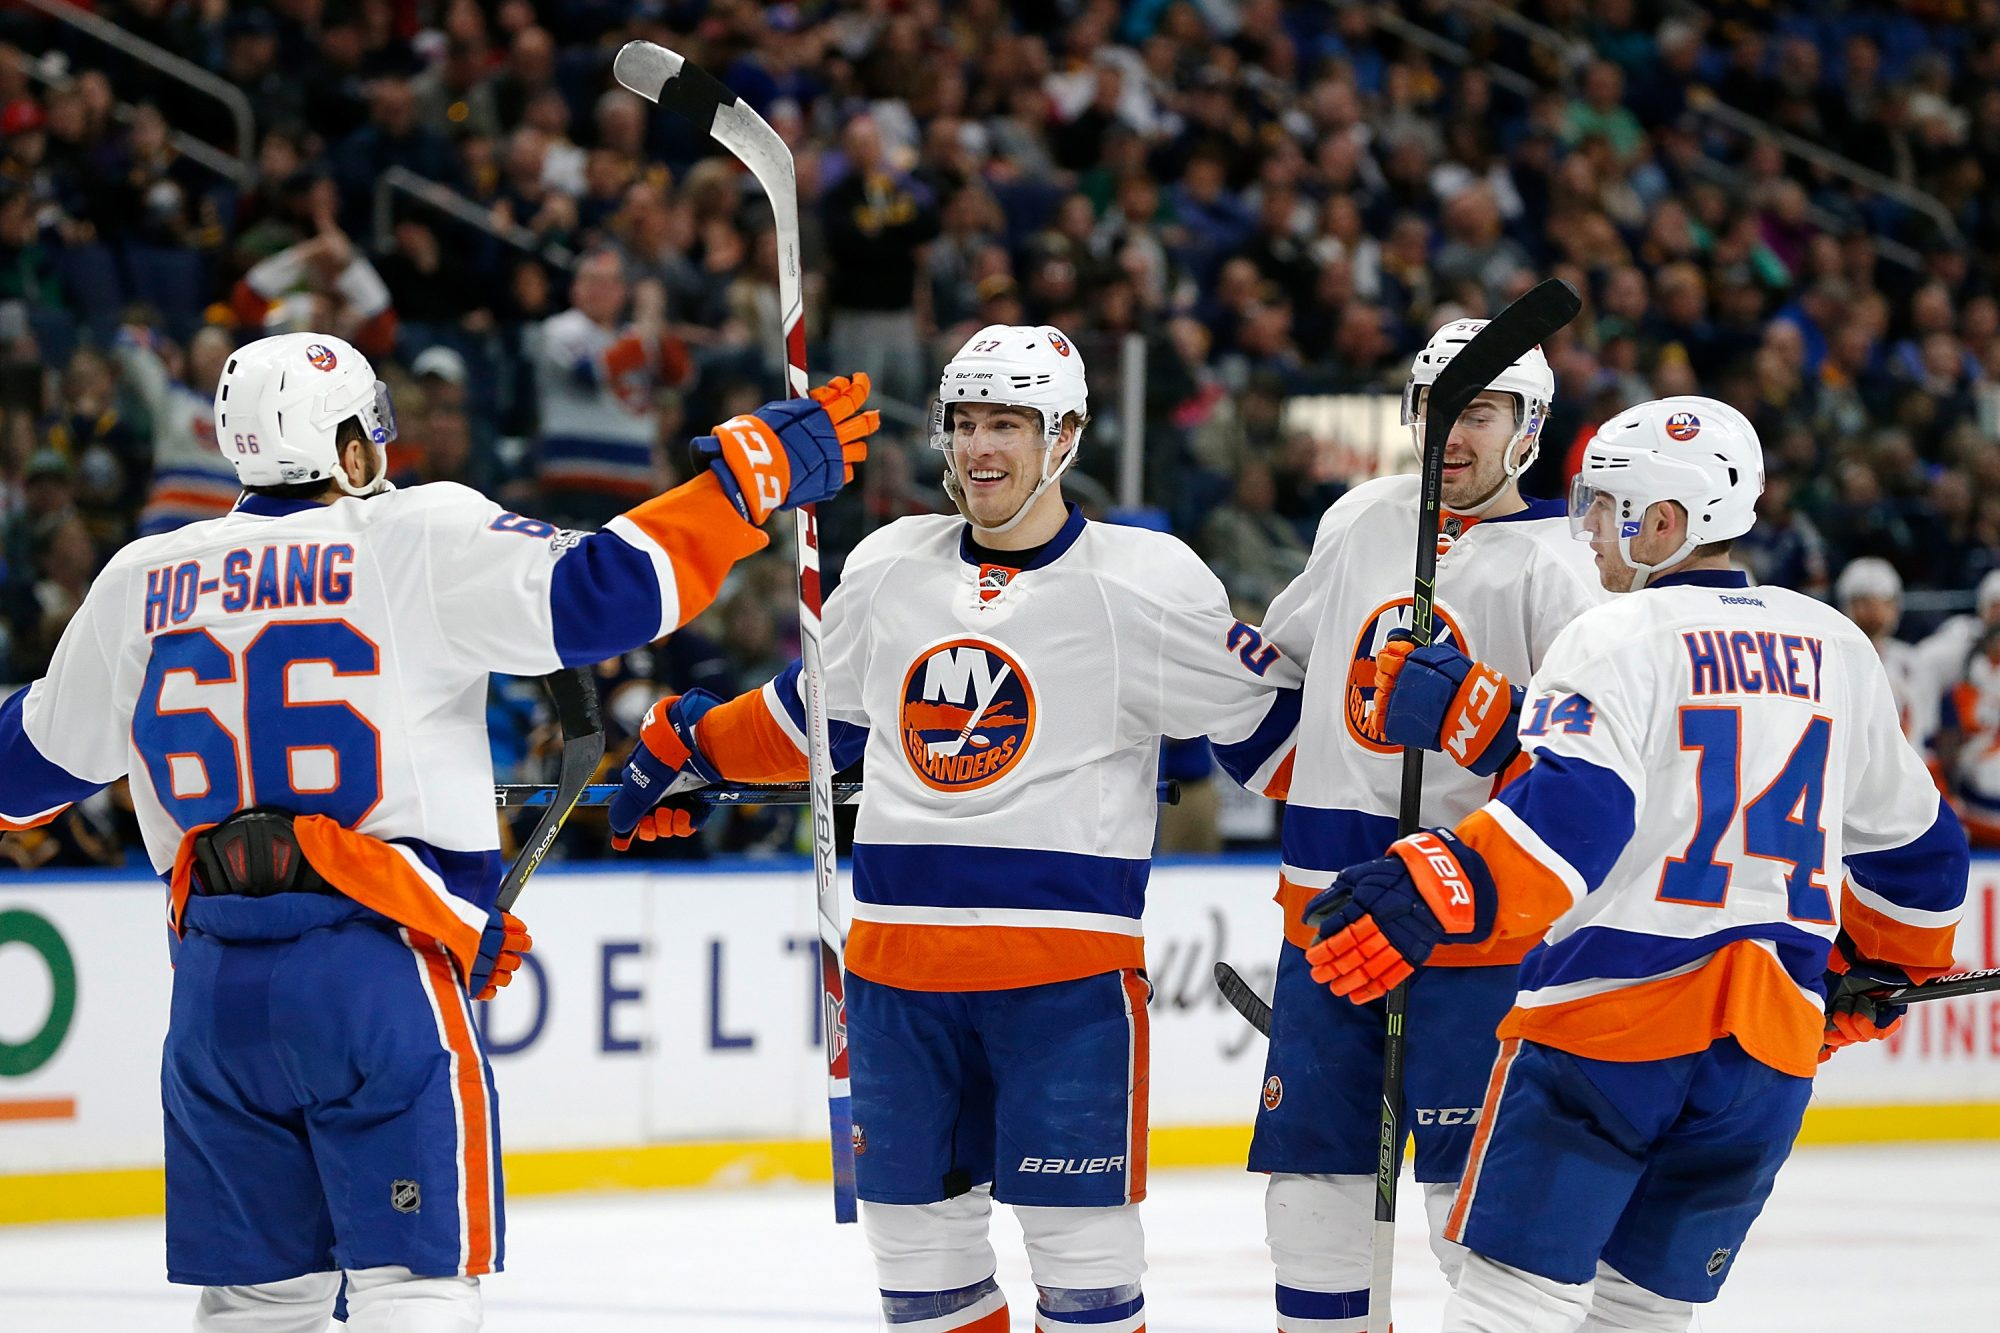 New York Islanders Edge Sabres 4-2, Keep Playoff Hopes Alive 1